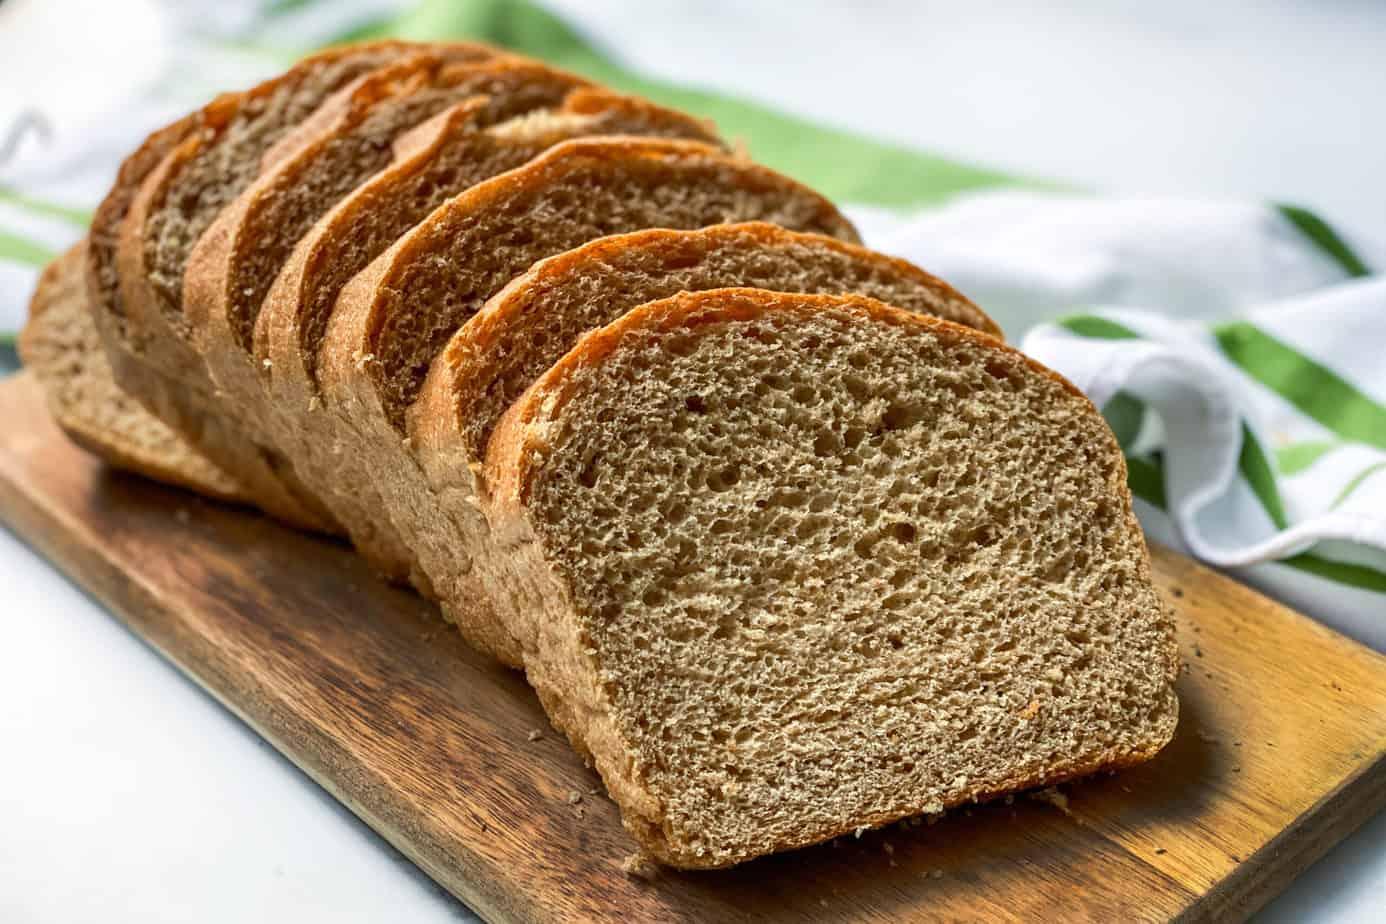 Sliced Homemade 100% Whole Wheat Bread on a Bread Board